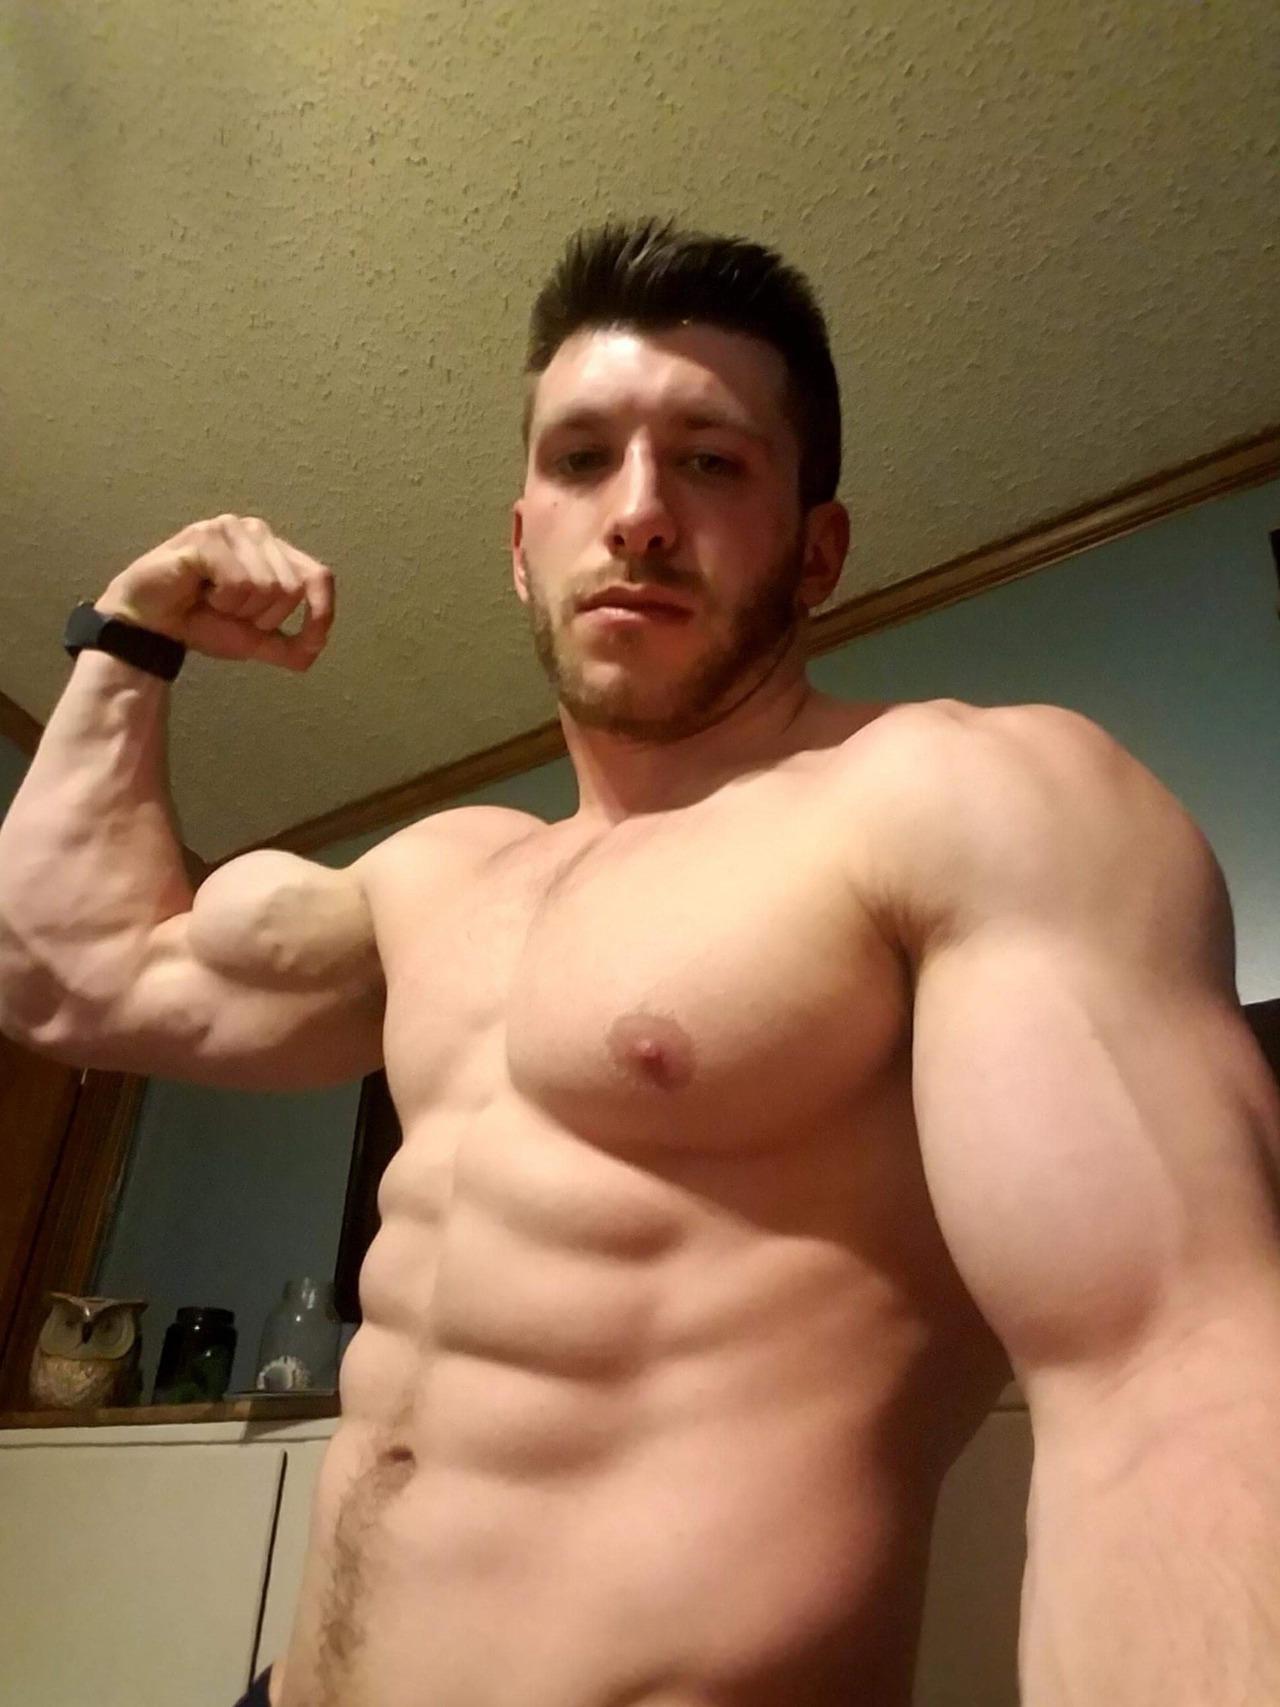 handsome-shirtless-masculine-beefy-guy-huge-pecs-sixpack-abs-biceps-flex-selfie